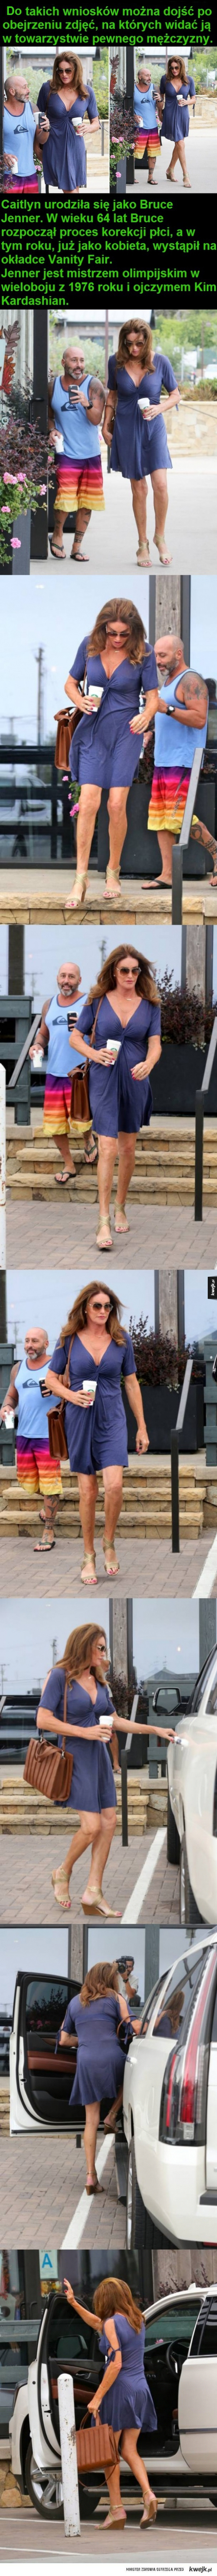 Caitlyn Jenner ma chłopaka?